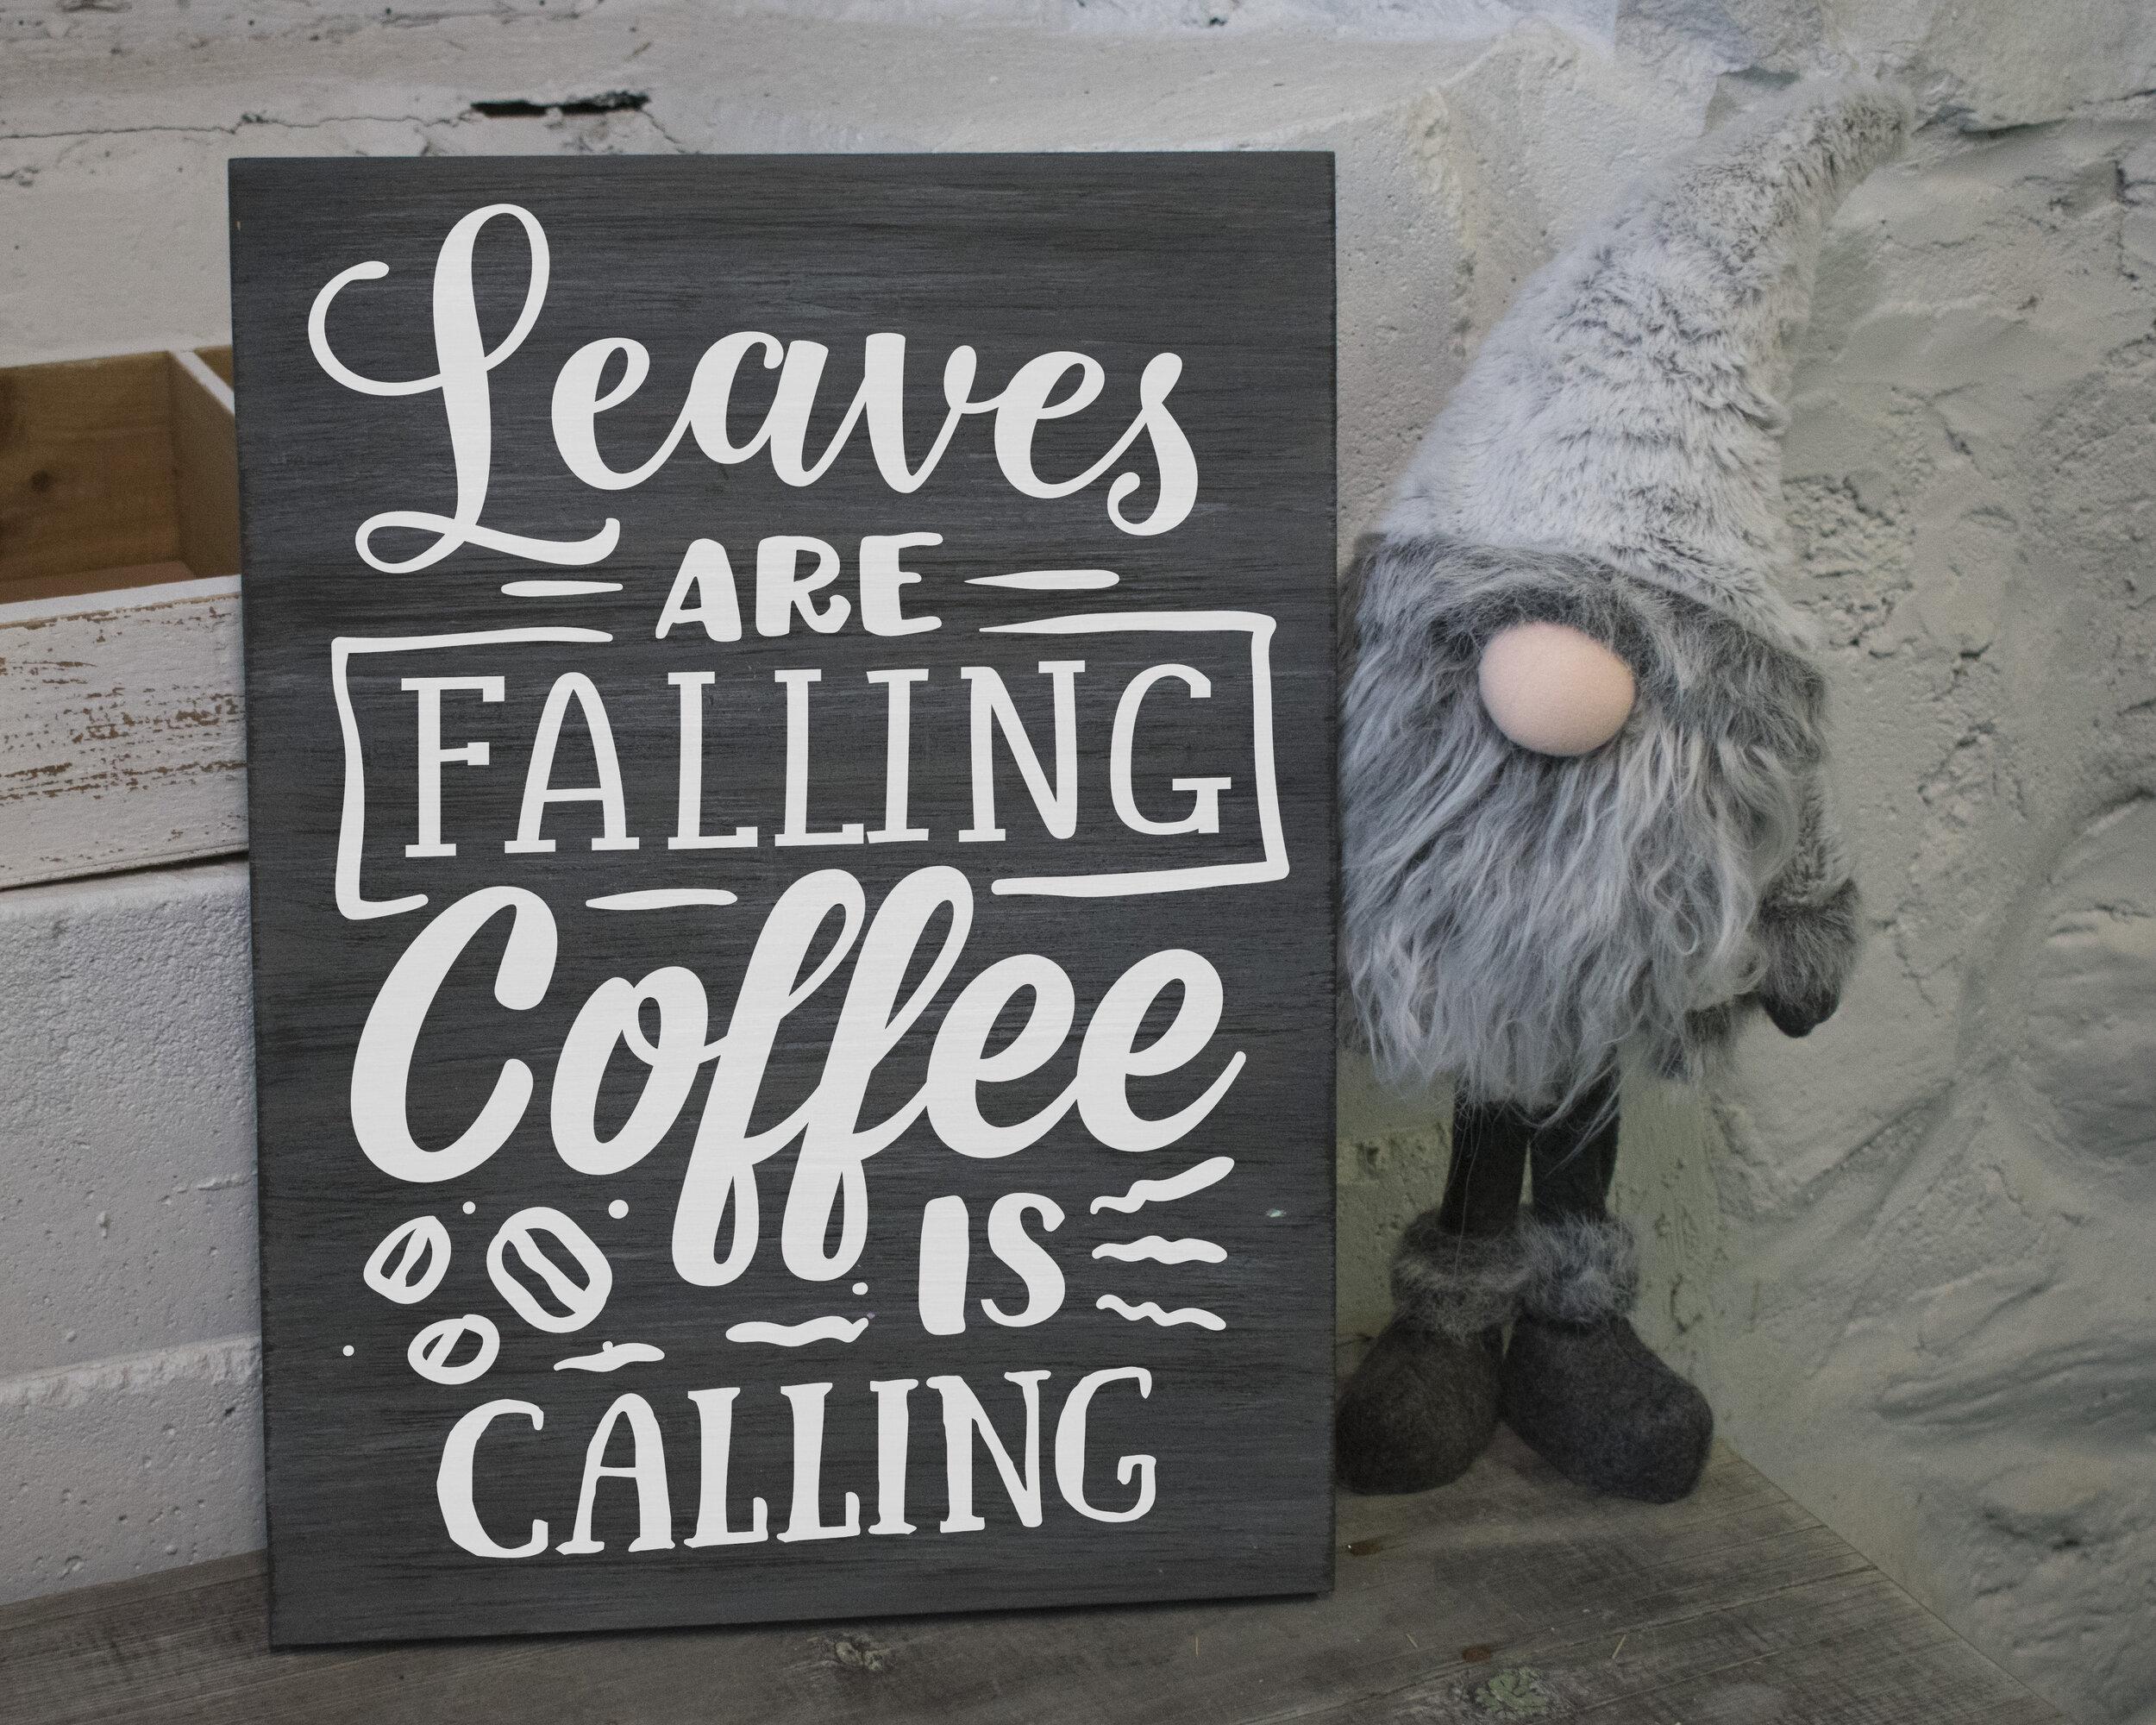 coffeecalling.jpg